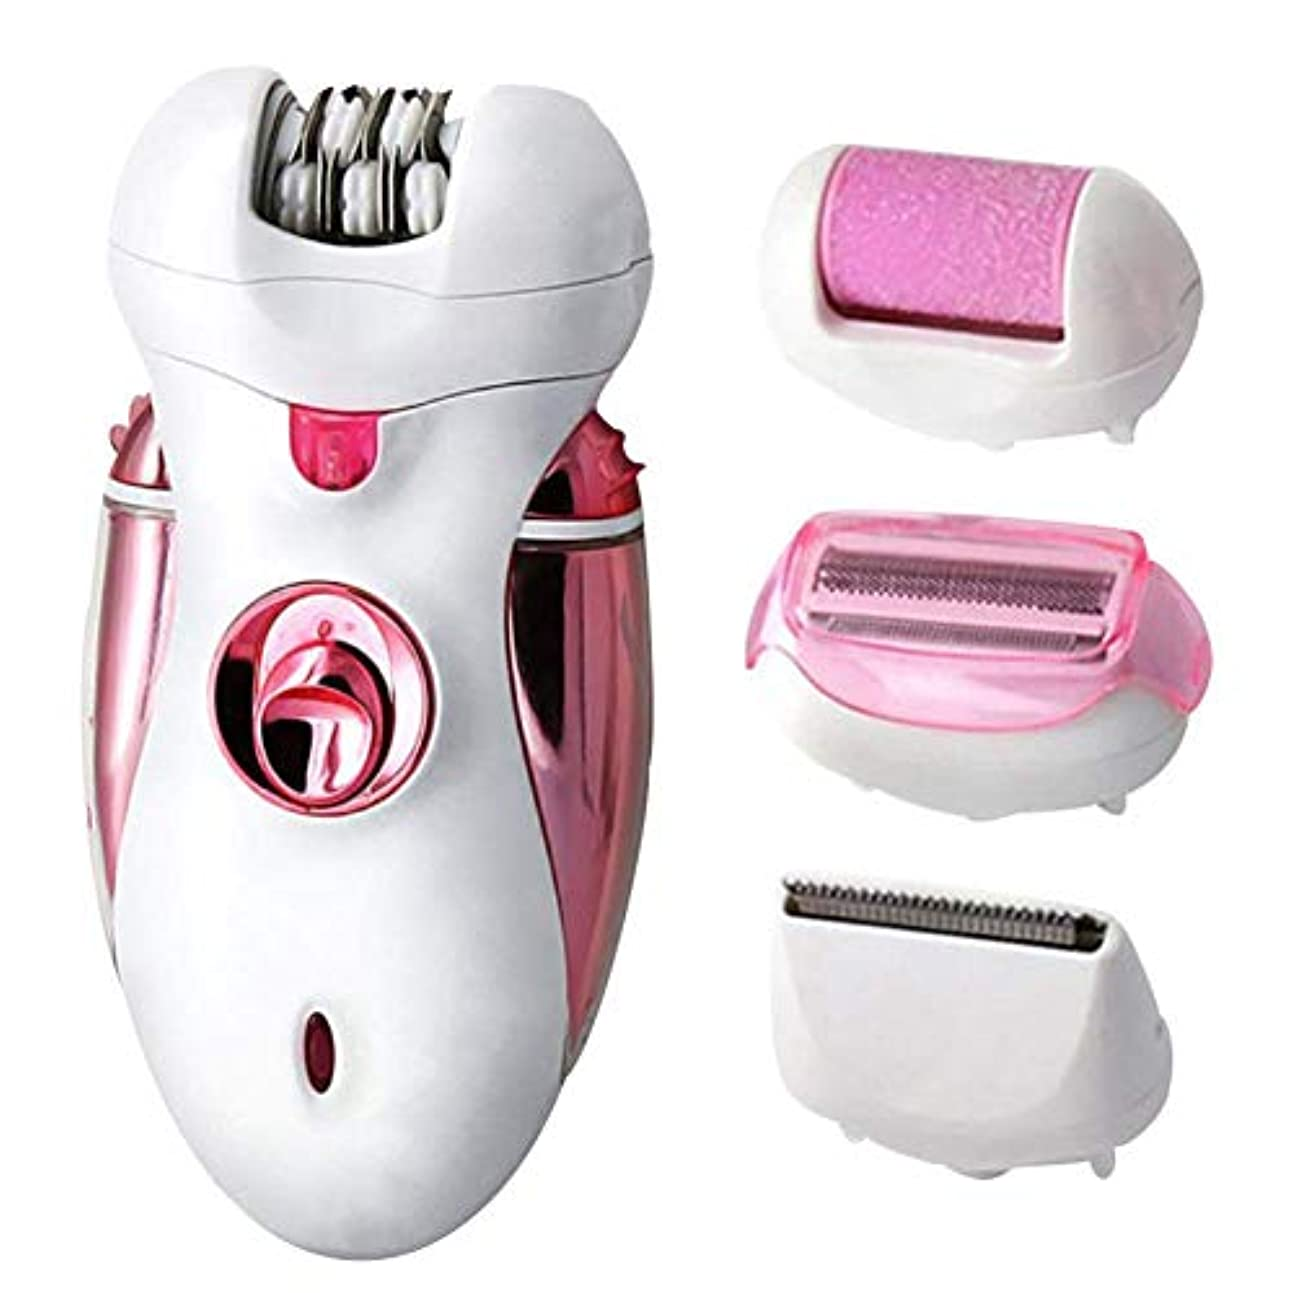 4-in-1女性の脱毛器ファッション多機能スタイリッシュな脱毛装置usb充電グライナーヘアシェービングマシン